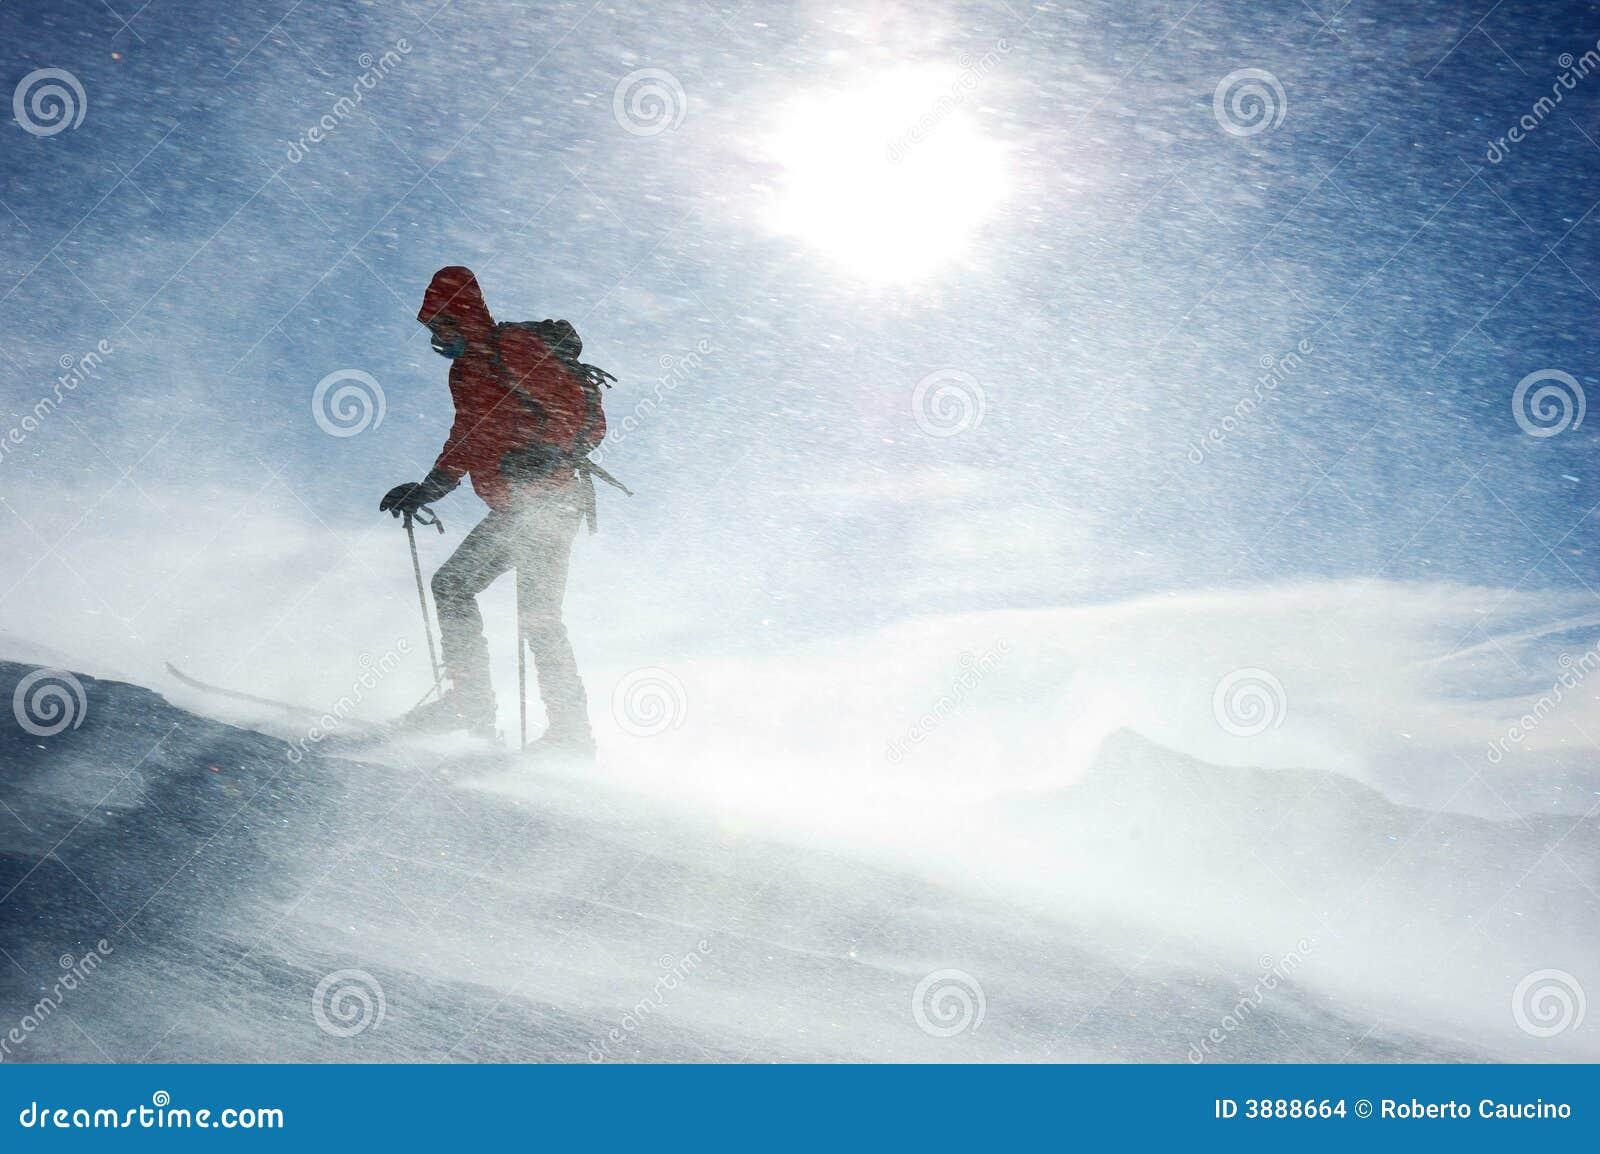 Skieur de Backcountry